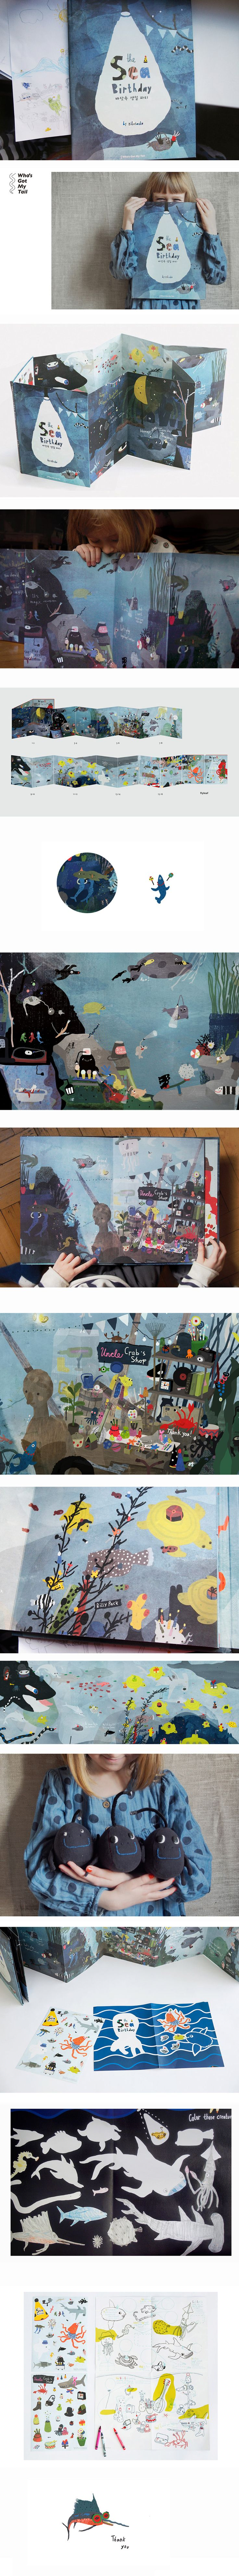 The Sea Birthday, Journals/Books © Илья и МаргаритаДонец